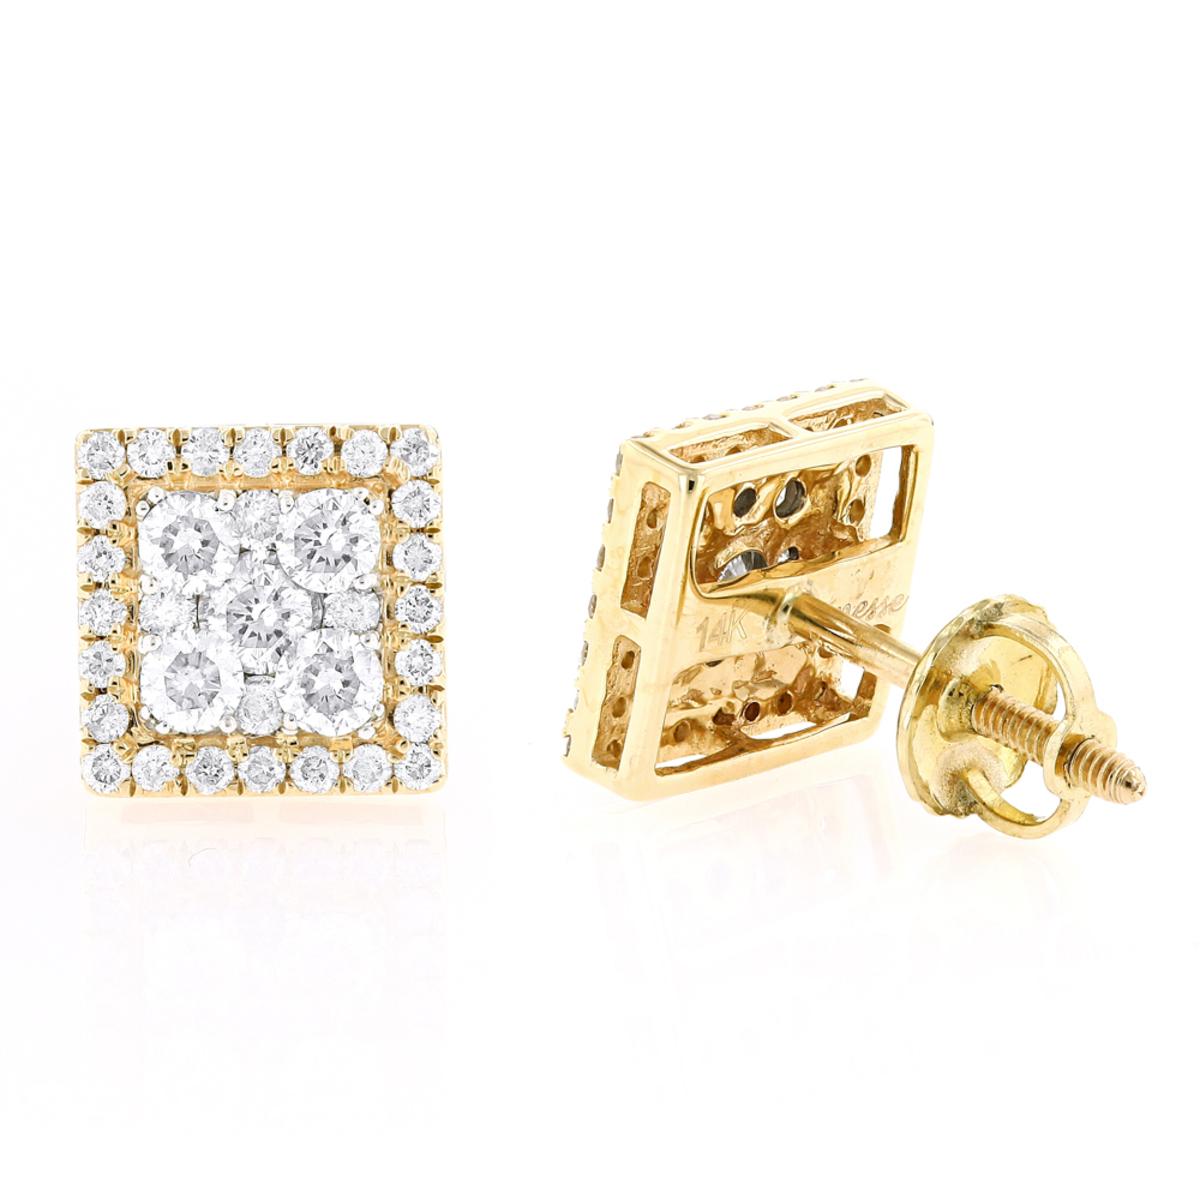 Square 14K Gold Diamond Stud Earrings 1.1ct